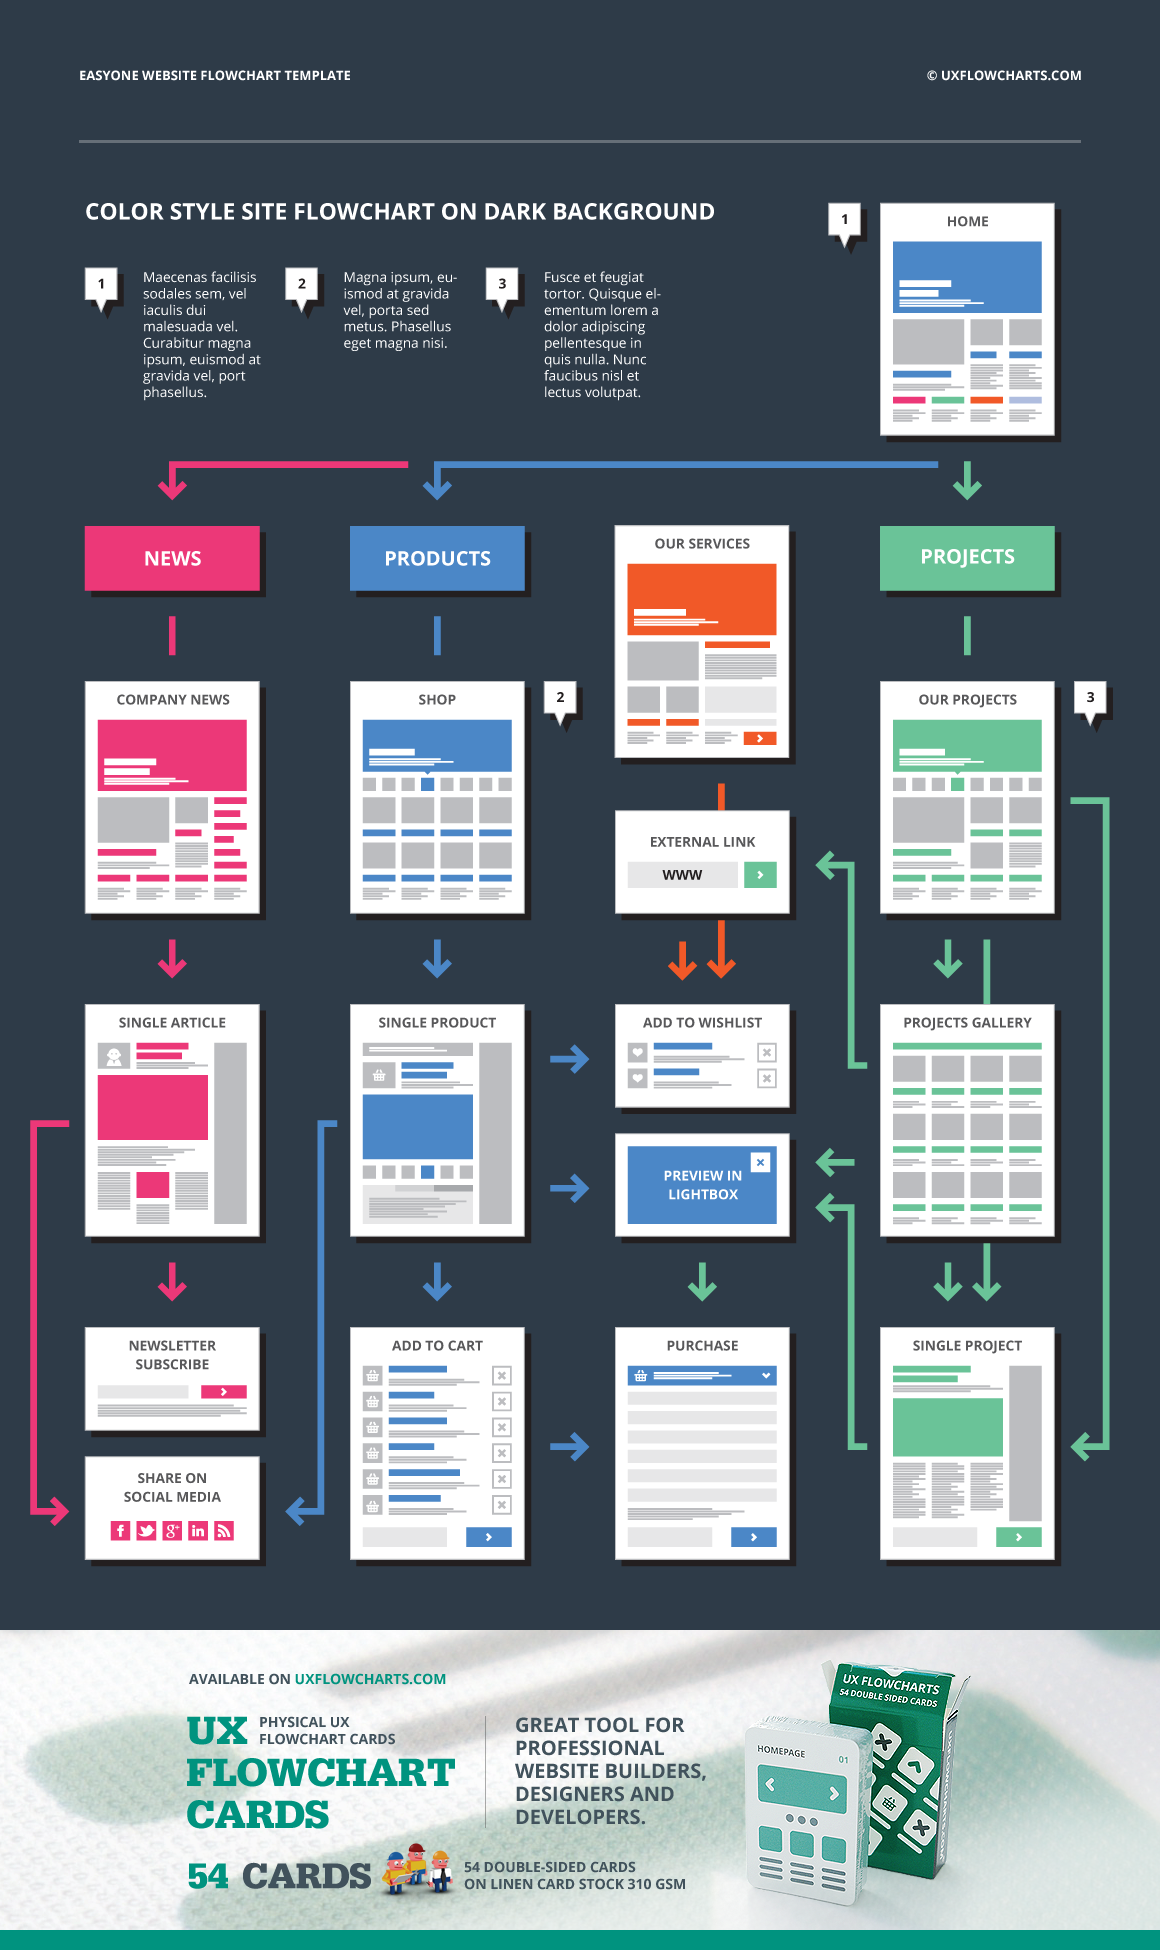 Easyone website flowchart template by ux flowcharts on creative market also rh pinterest